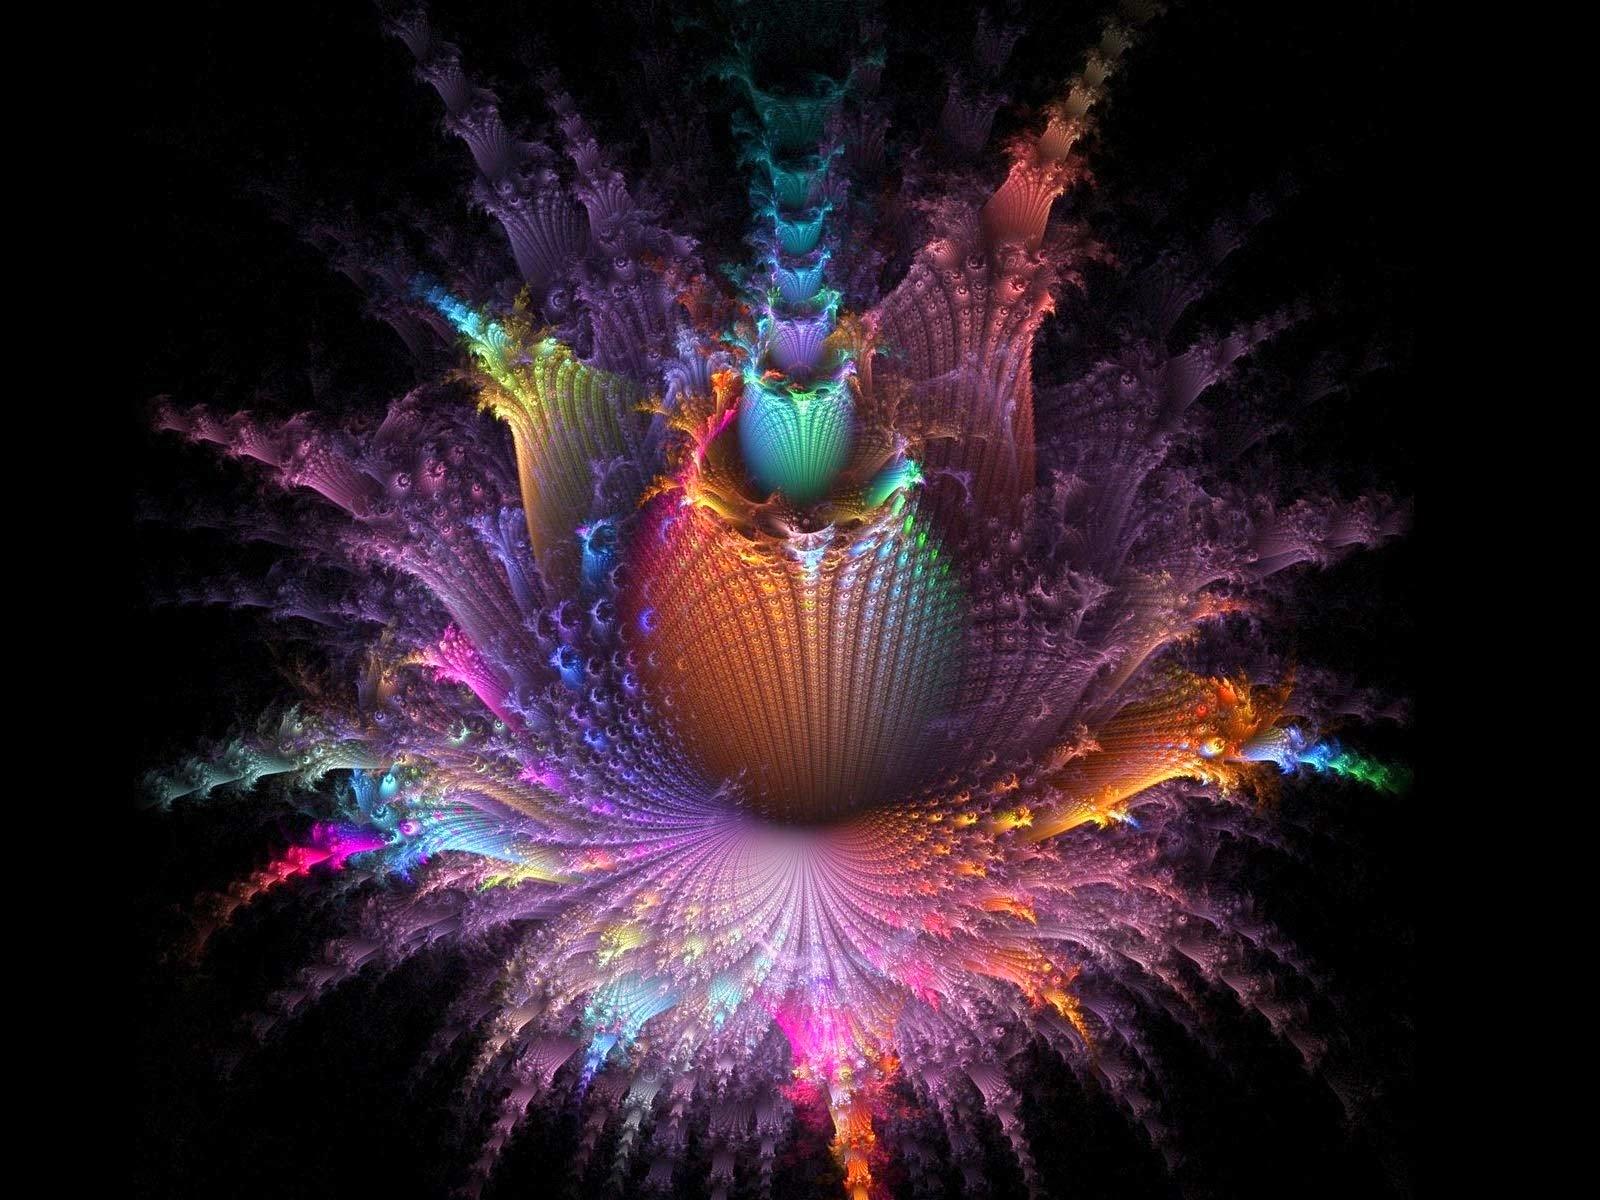 Fractal Art Colorful Desktop Wallpaper Uploaded by mayur 1600x1200